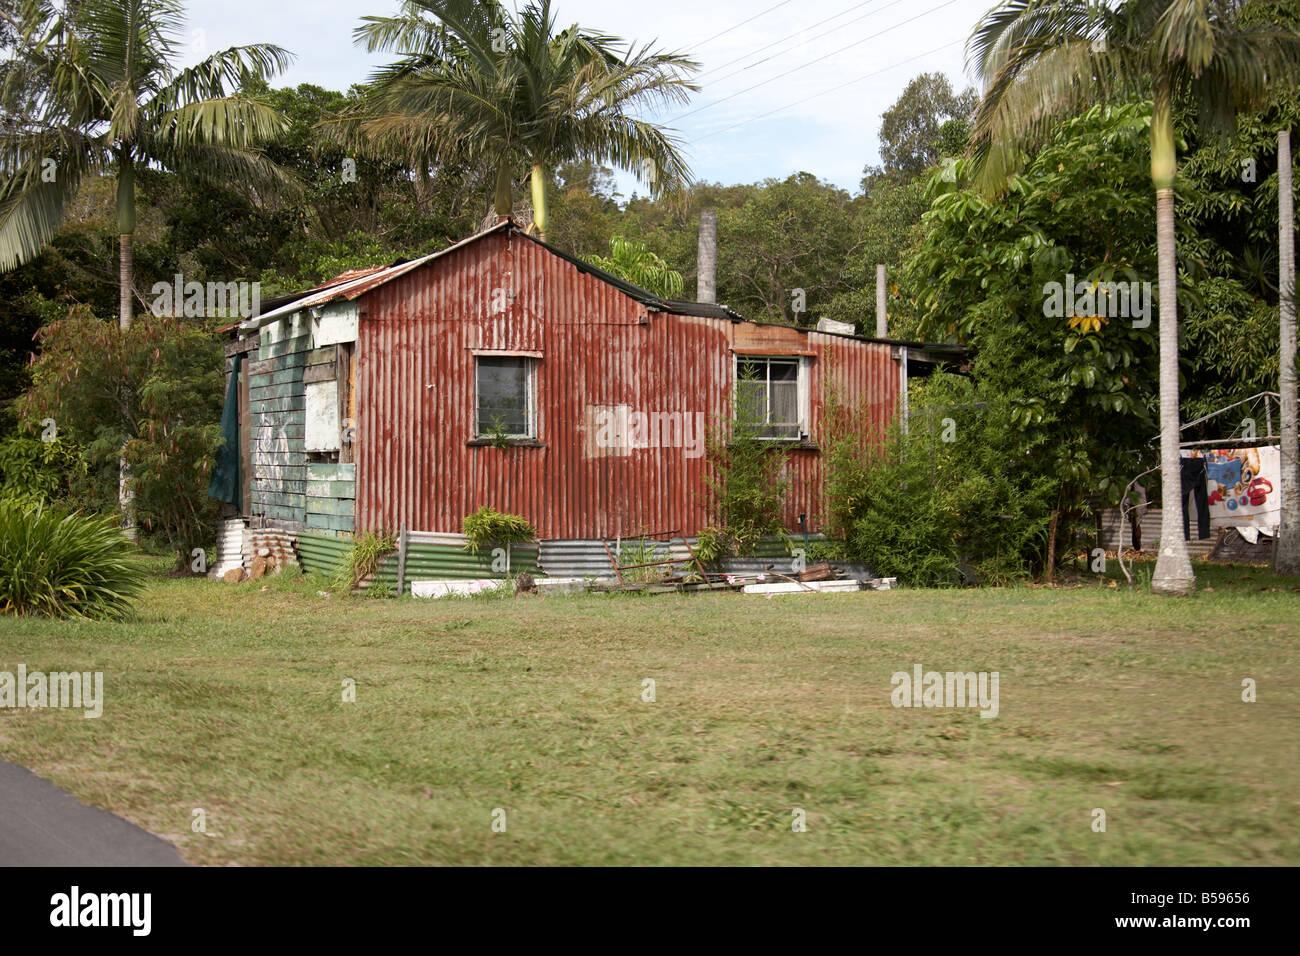 Aboriginal corrugated iron clad house on Stradbroke Island Queensland QLD Australia - Stock Image